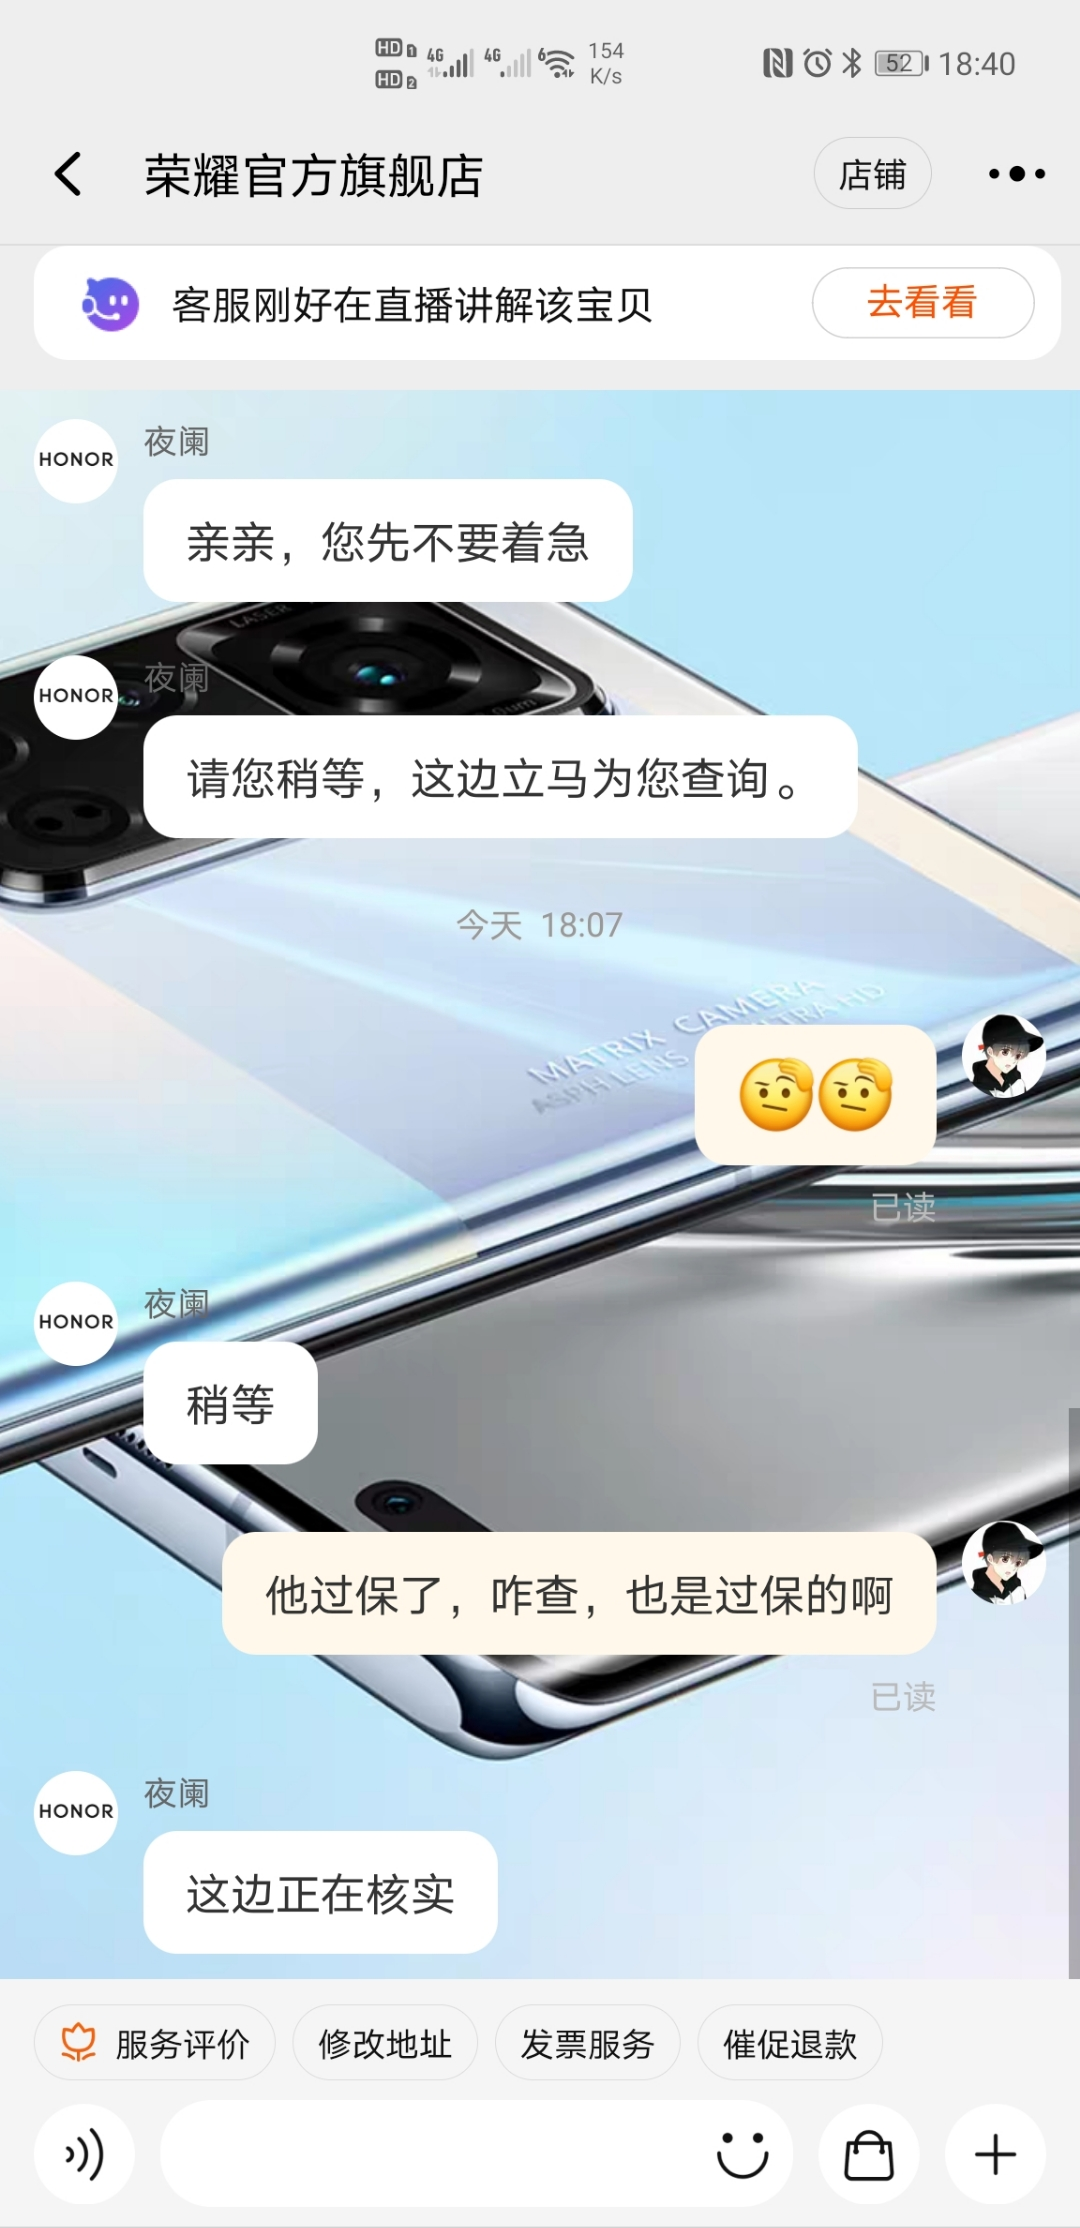 Screenshot_20210601_184028_com.taobao.taobao.jpg